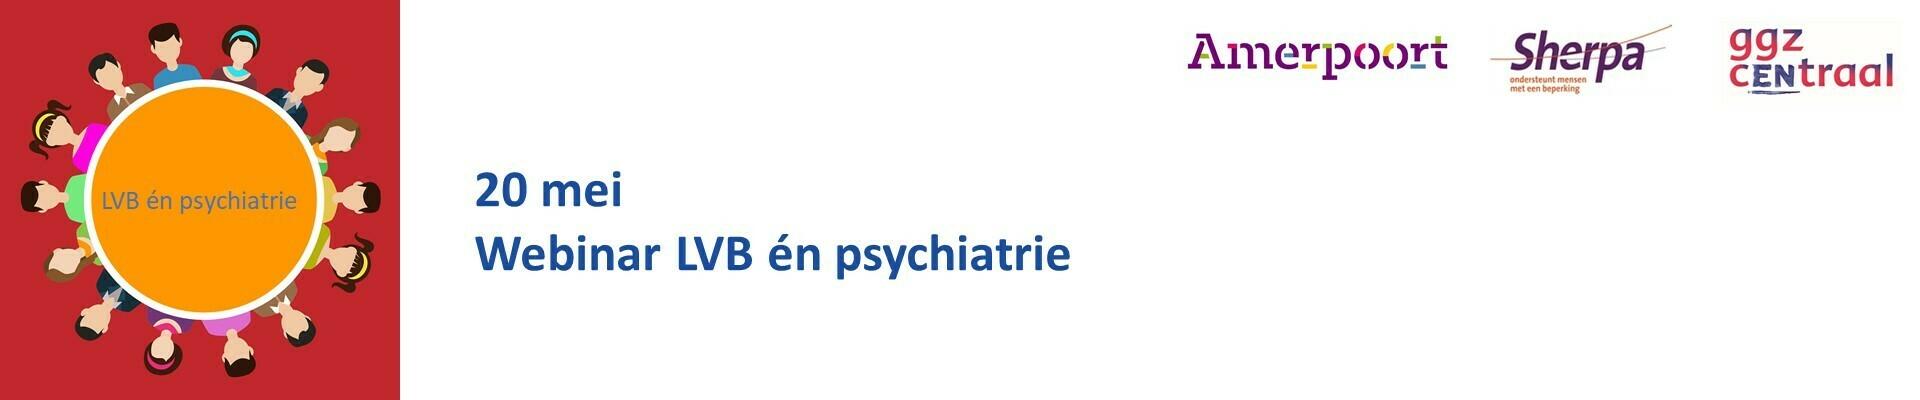 LVB én Psychiatrie